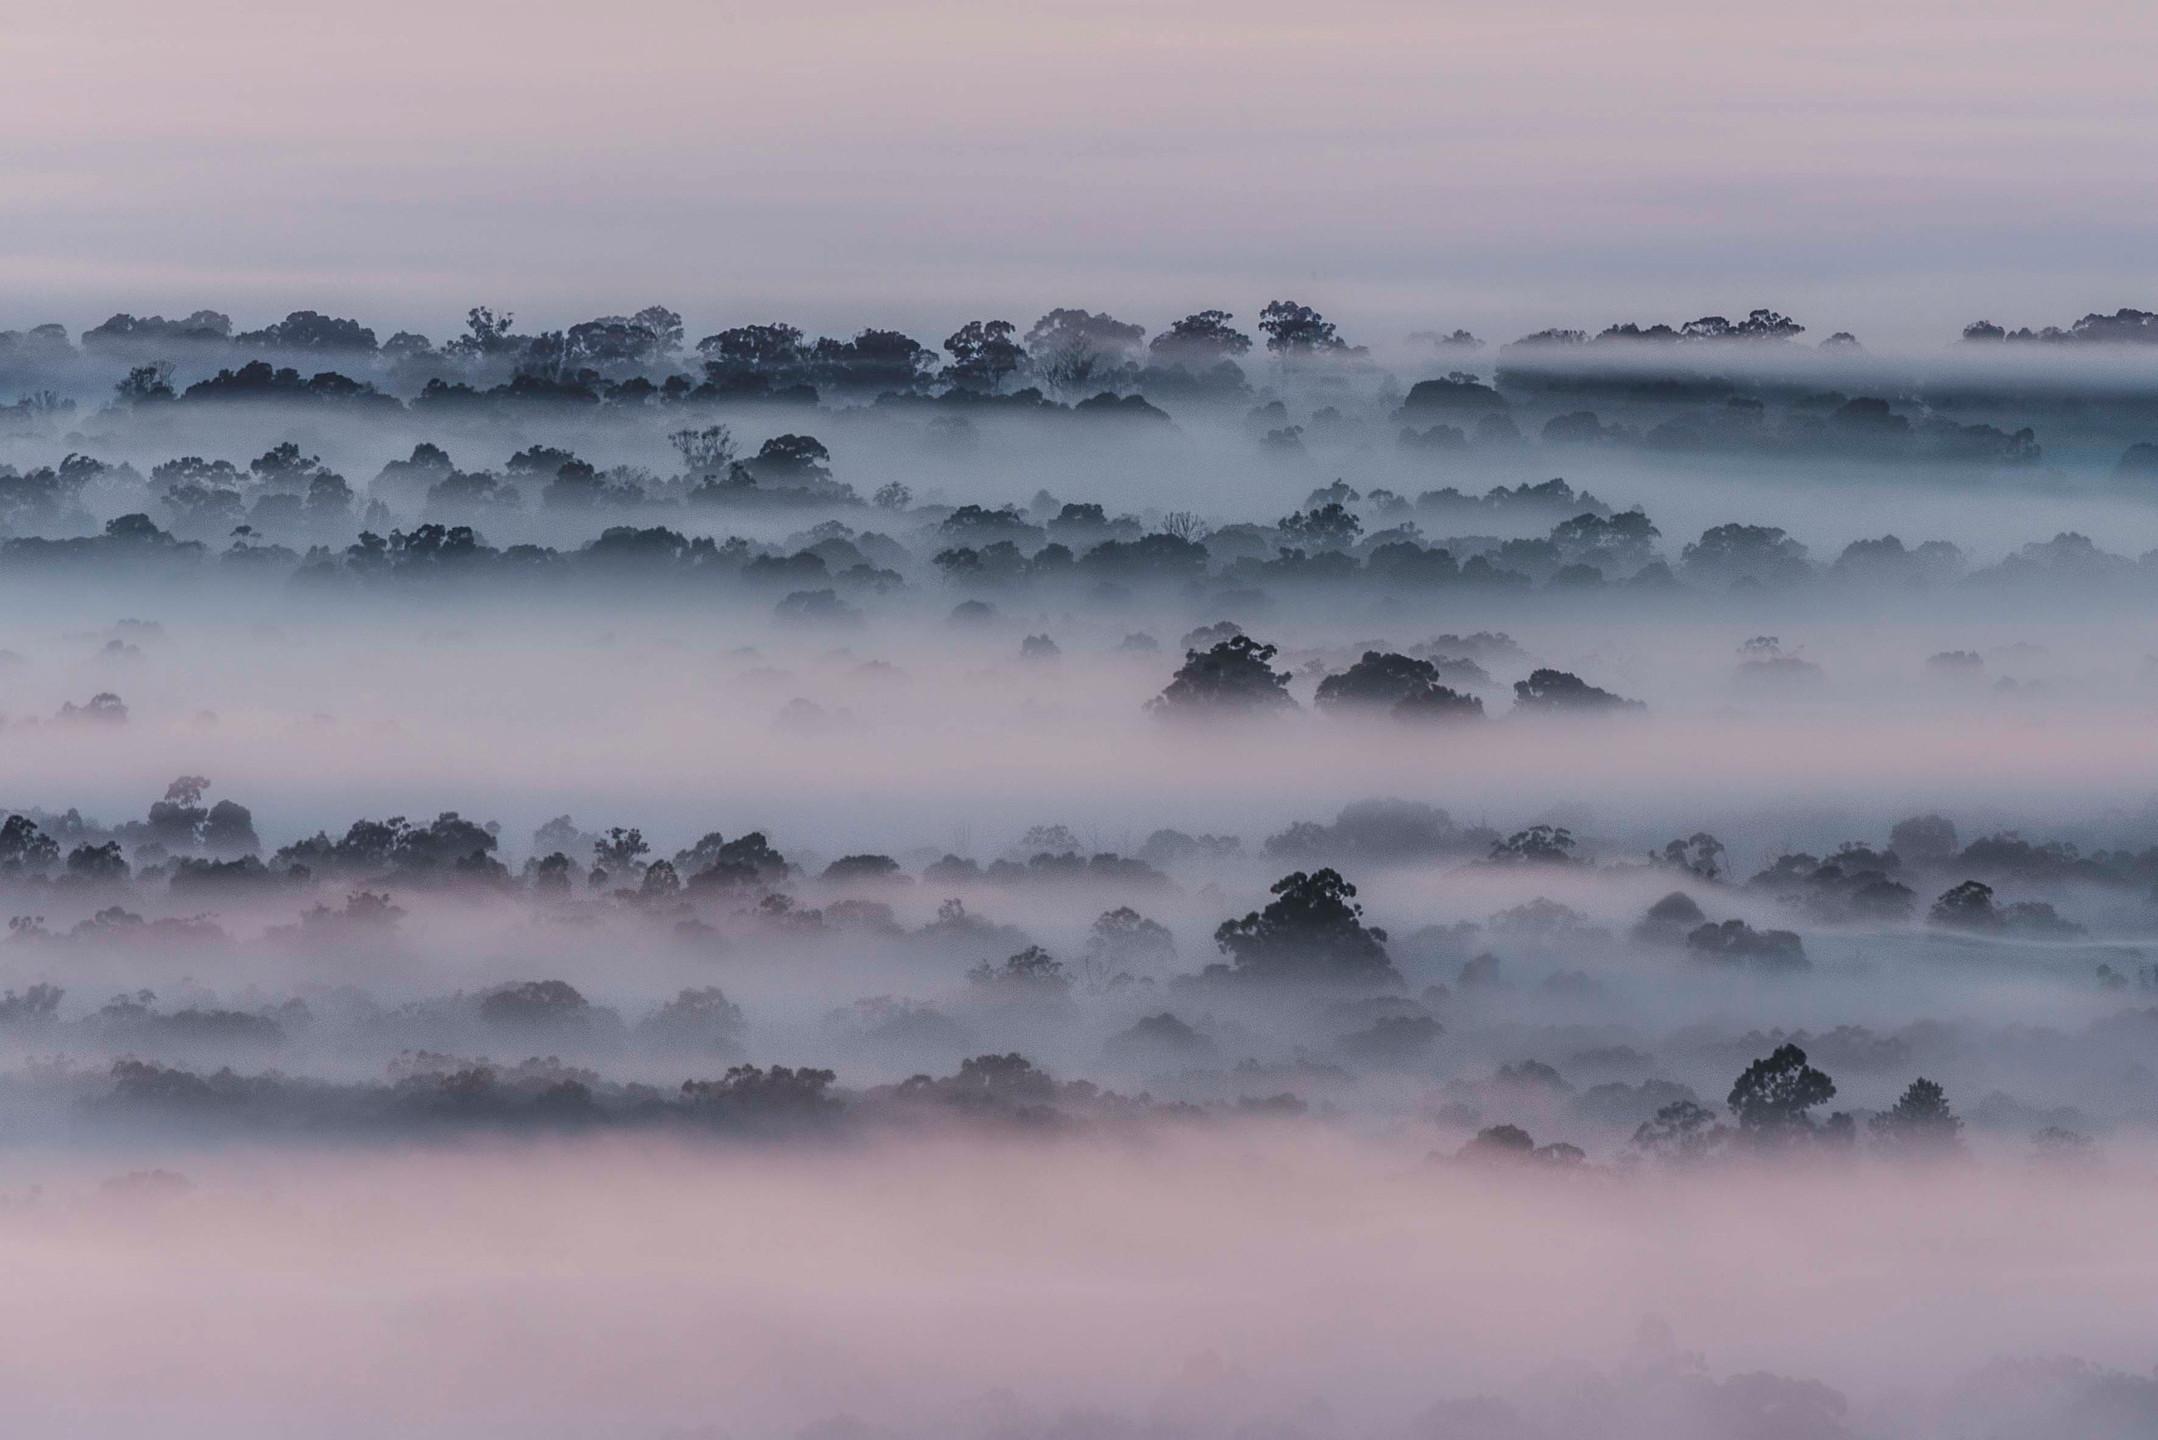 Morning mist over Yarramundi from Yellowmundi (Hawkesbury Heights) Lookout.